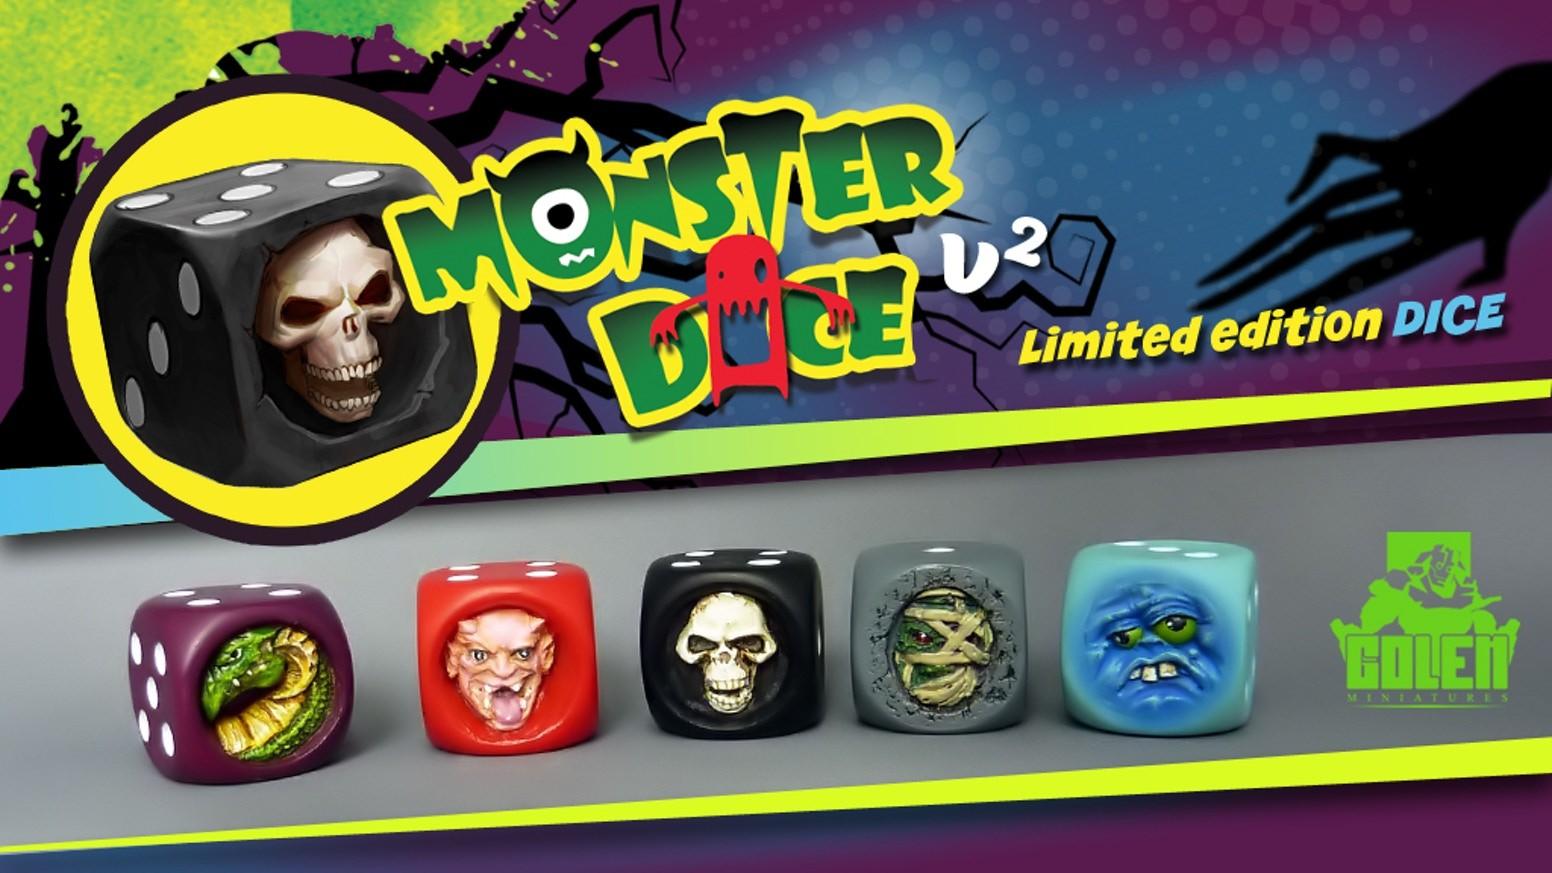 Monstrodes2